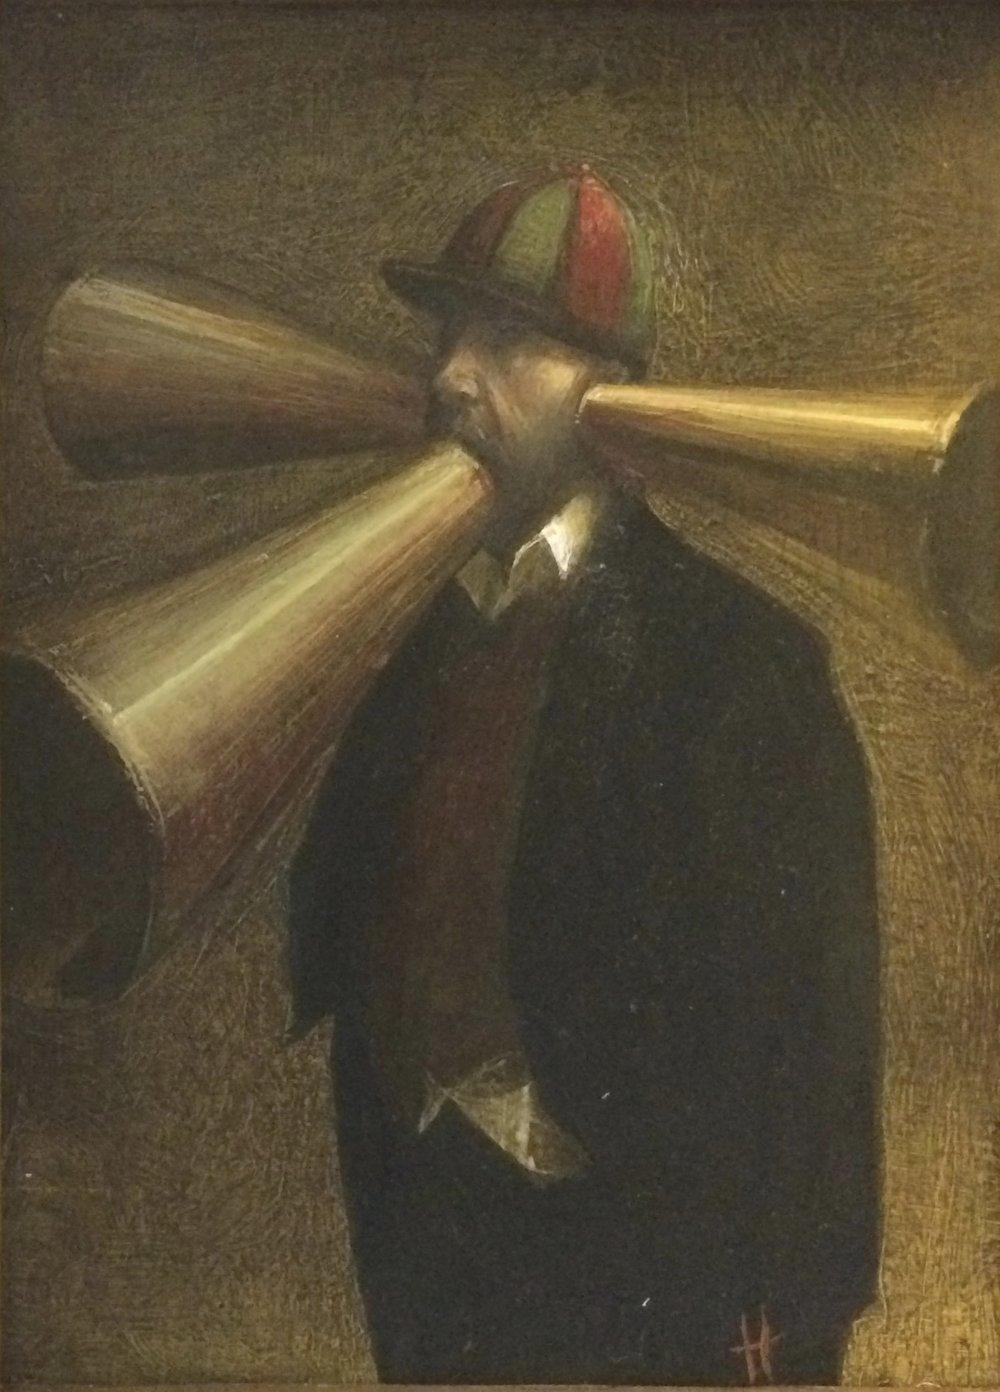 Artist: Kevin Hendley  Title: Soundwaves  Size: 20 x 15 cm  Medium: Oil on panel  Price: £1450